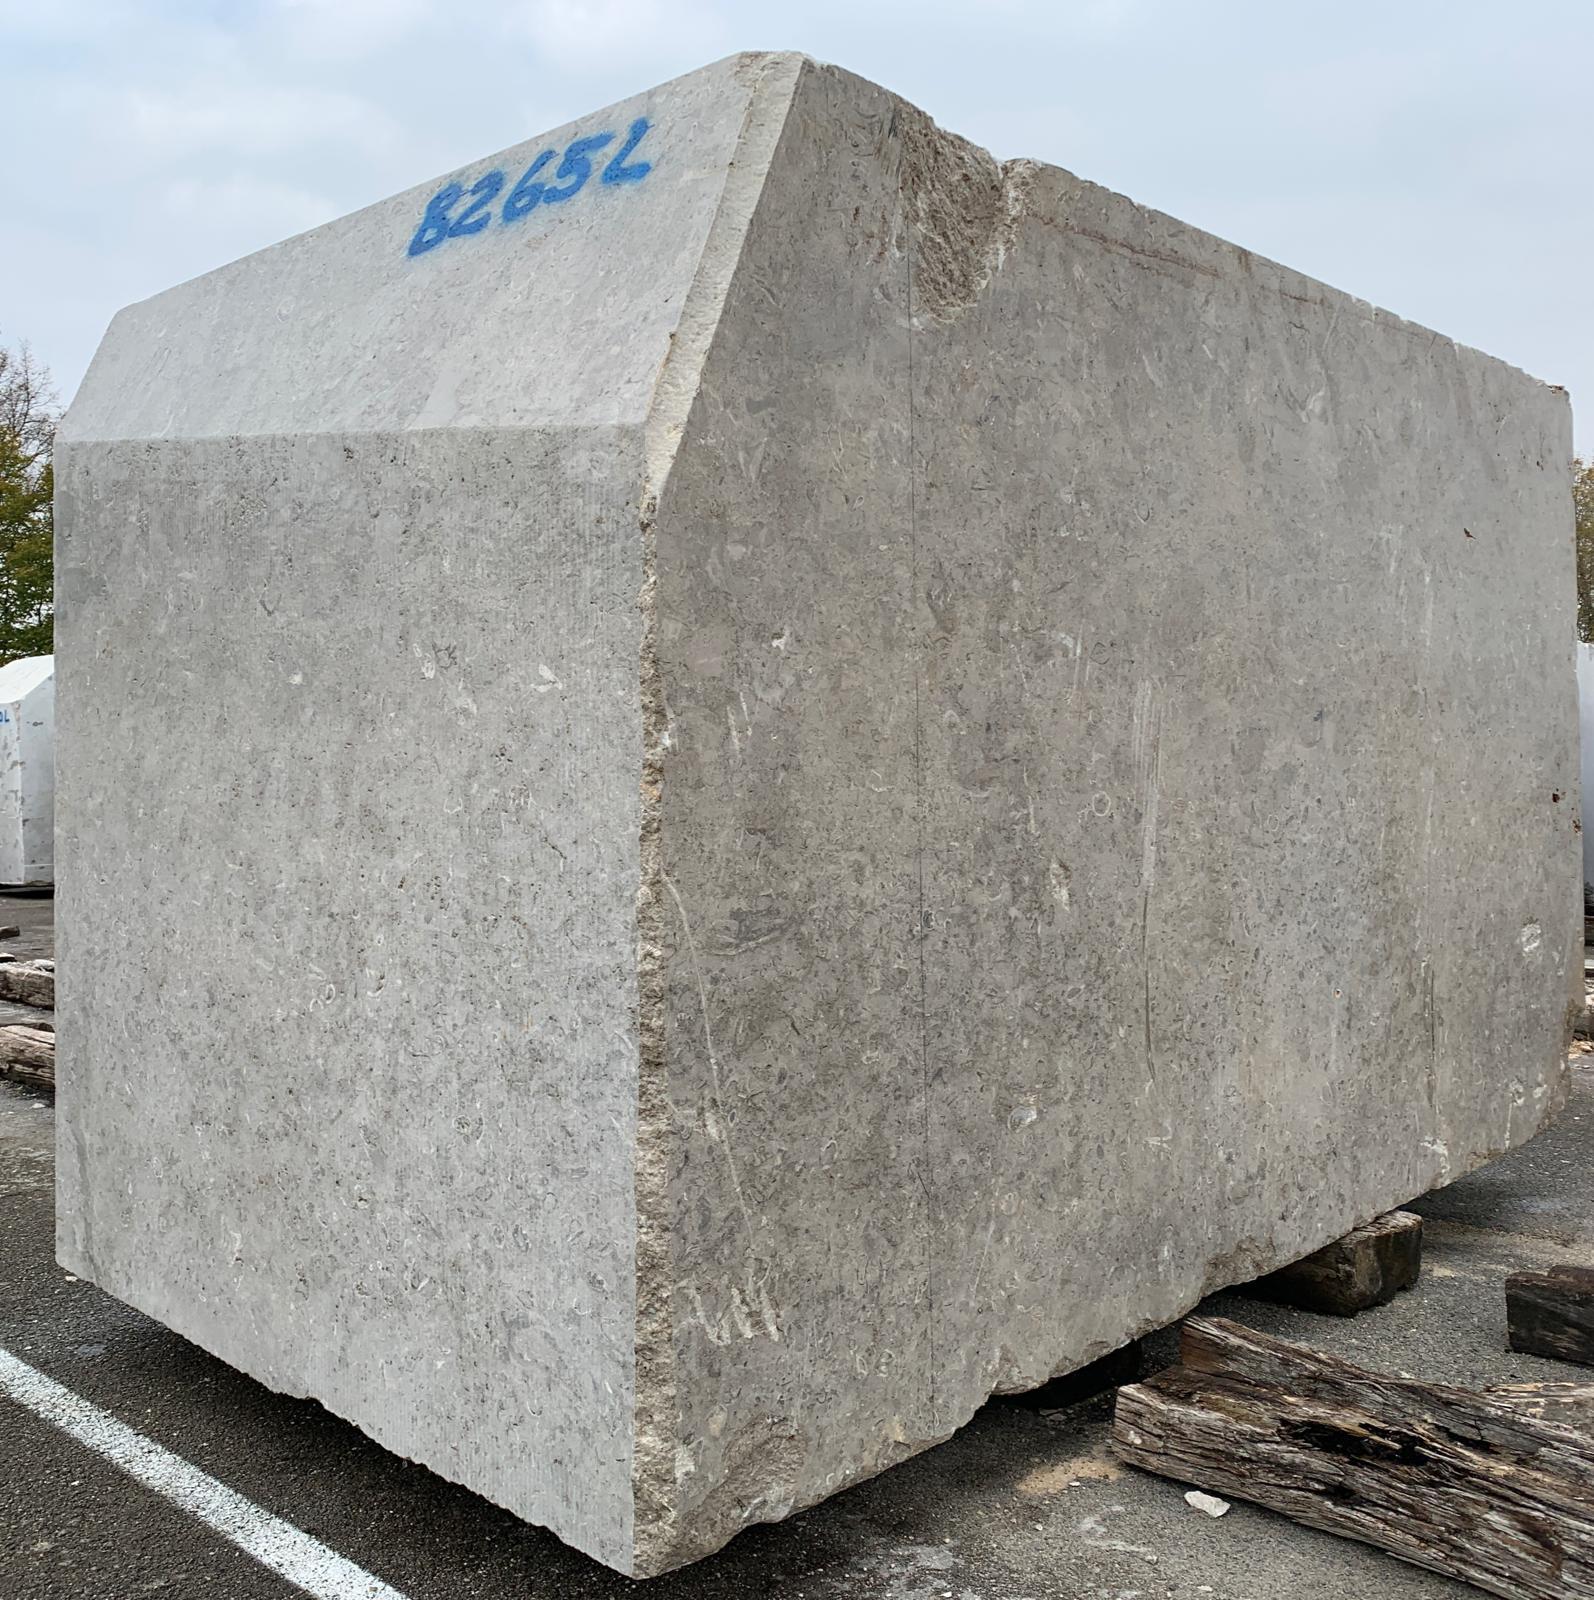 B265L - 305x175x170cm - 23.30tn (1)